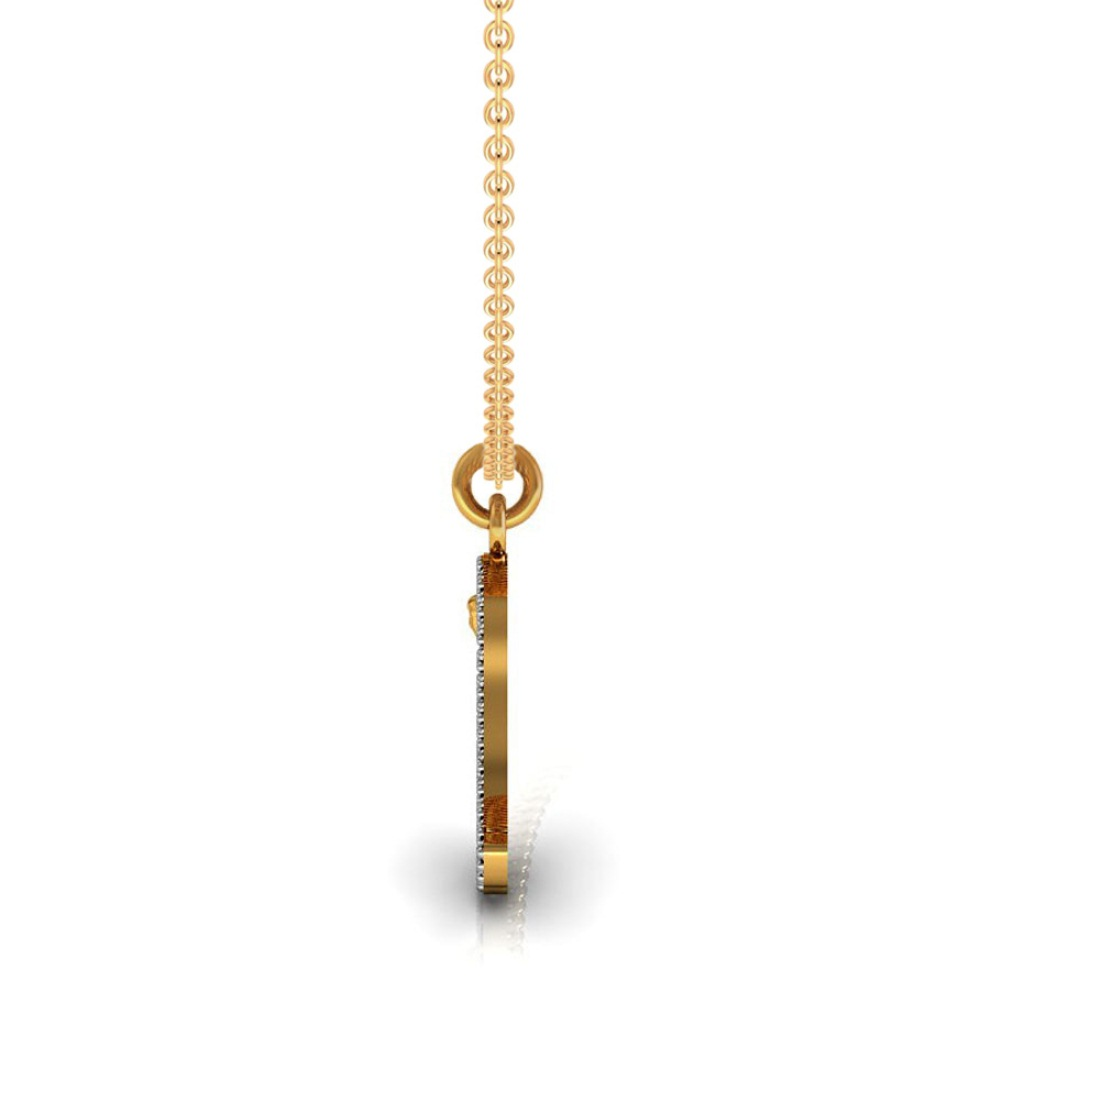 18k Solid gold bird shape kids pendant adorned with diamond